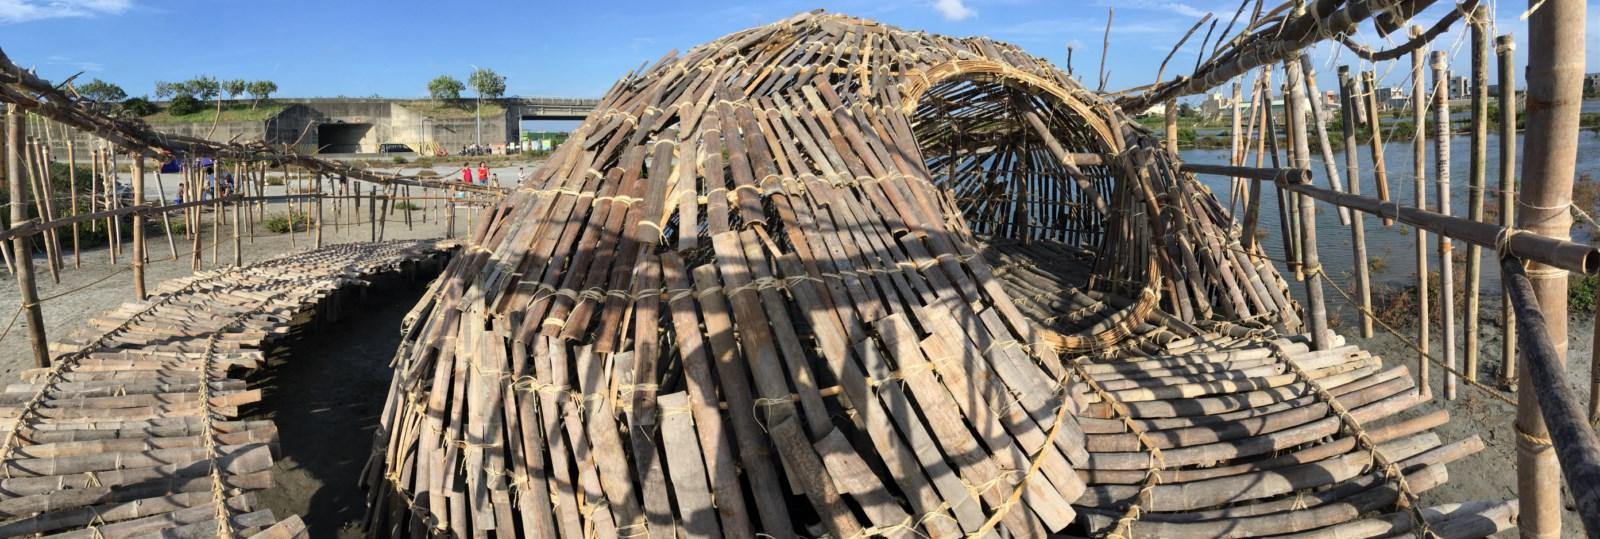 Chenglong shelter 10 [1600x1200]